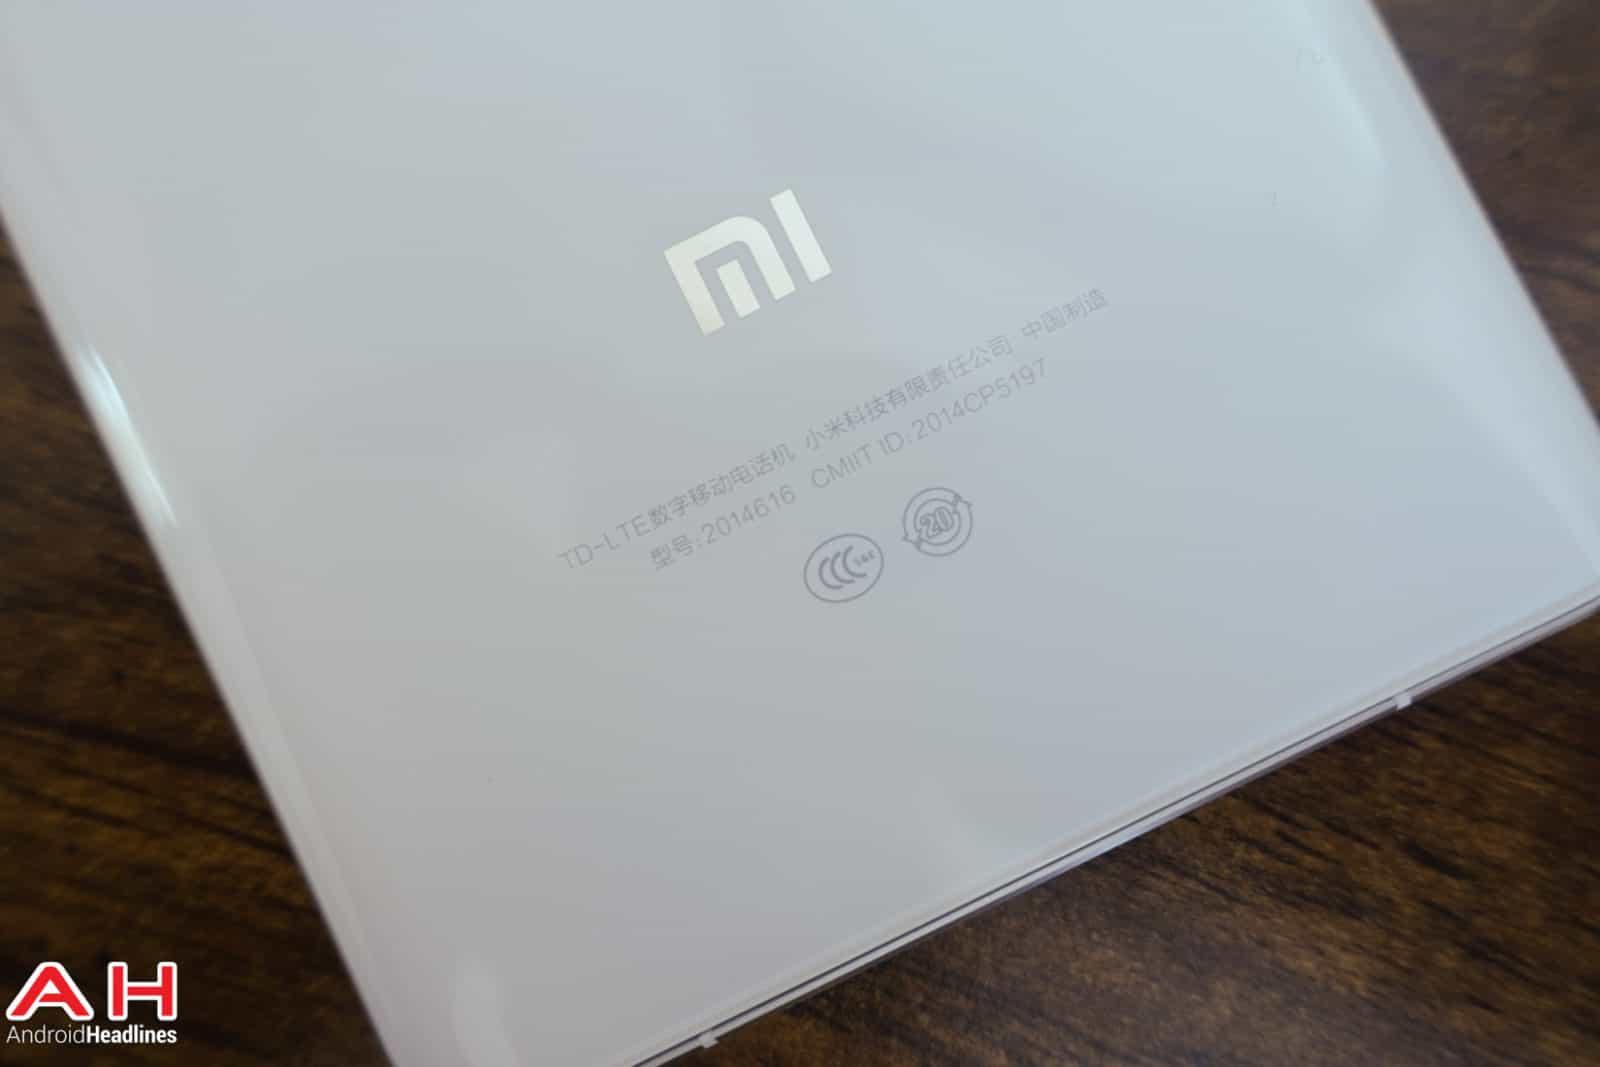 Xiaomi-Mi-Note-AH-03770